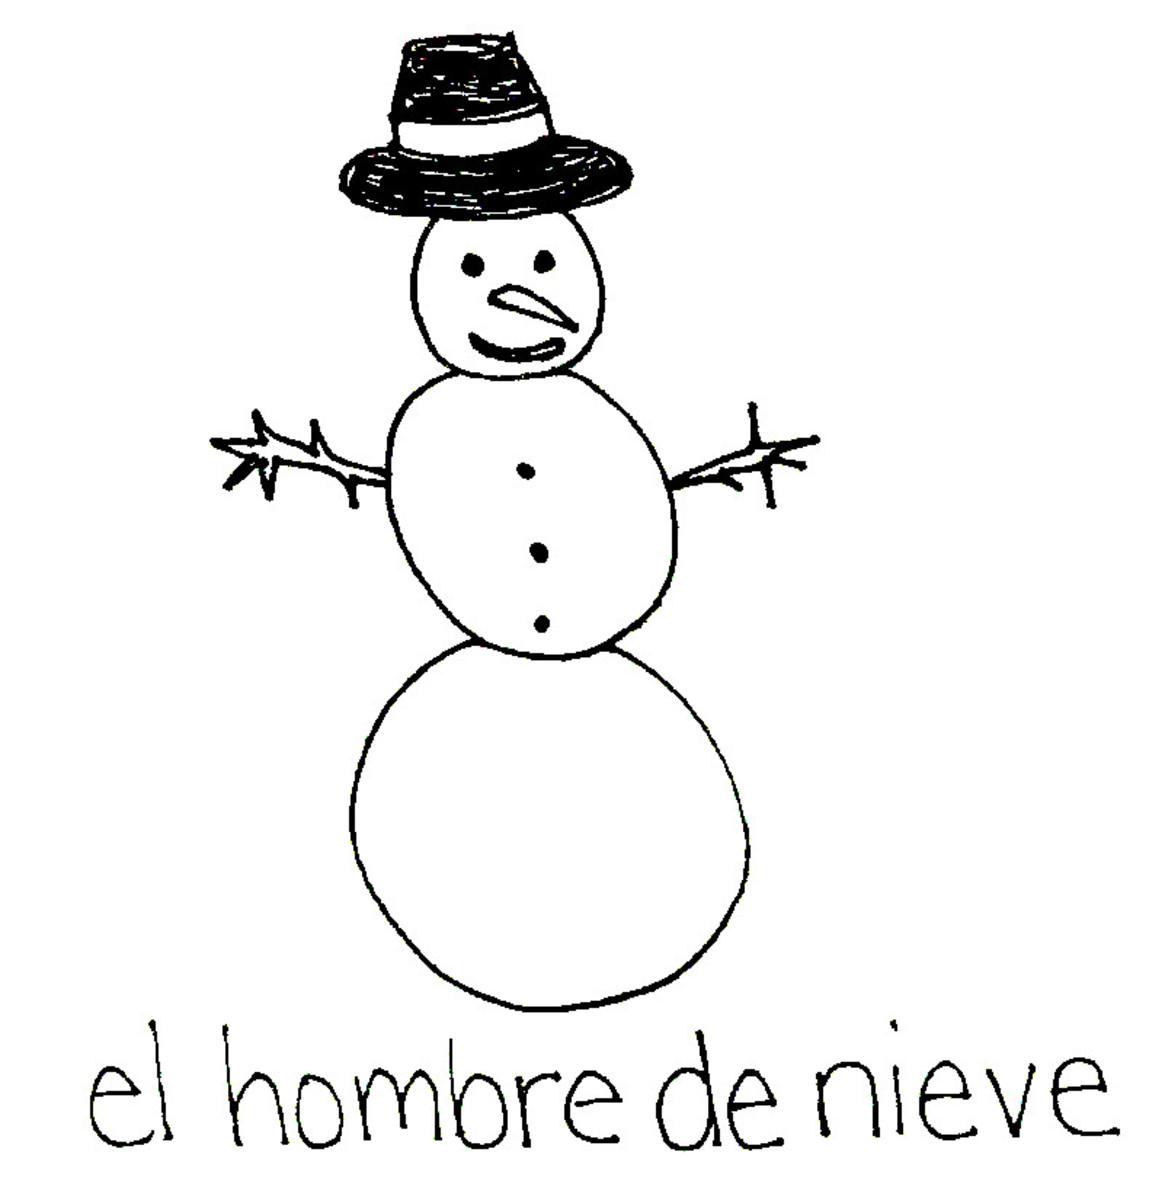 Snowman in Spanish